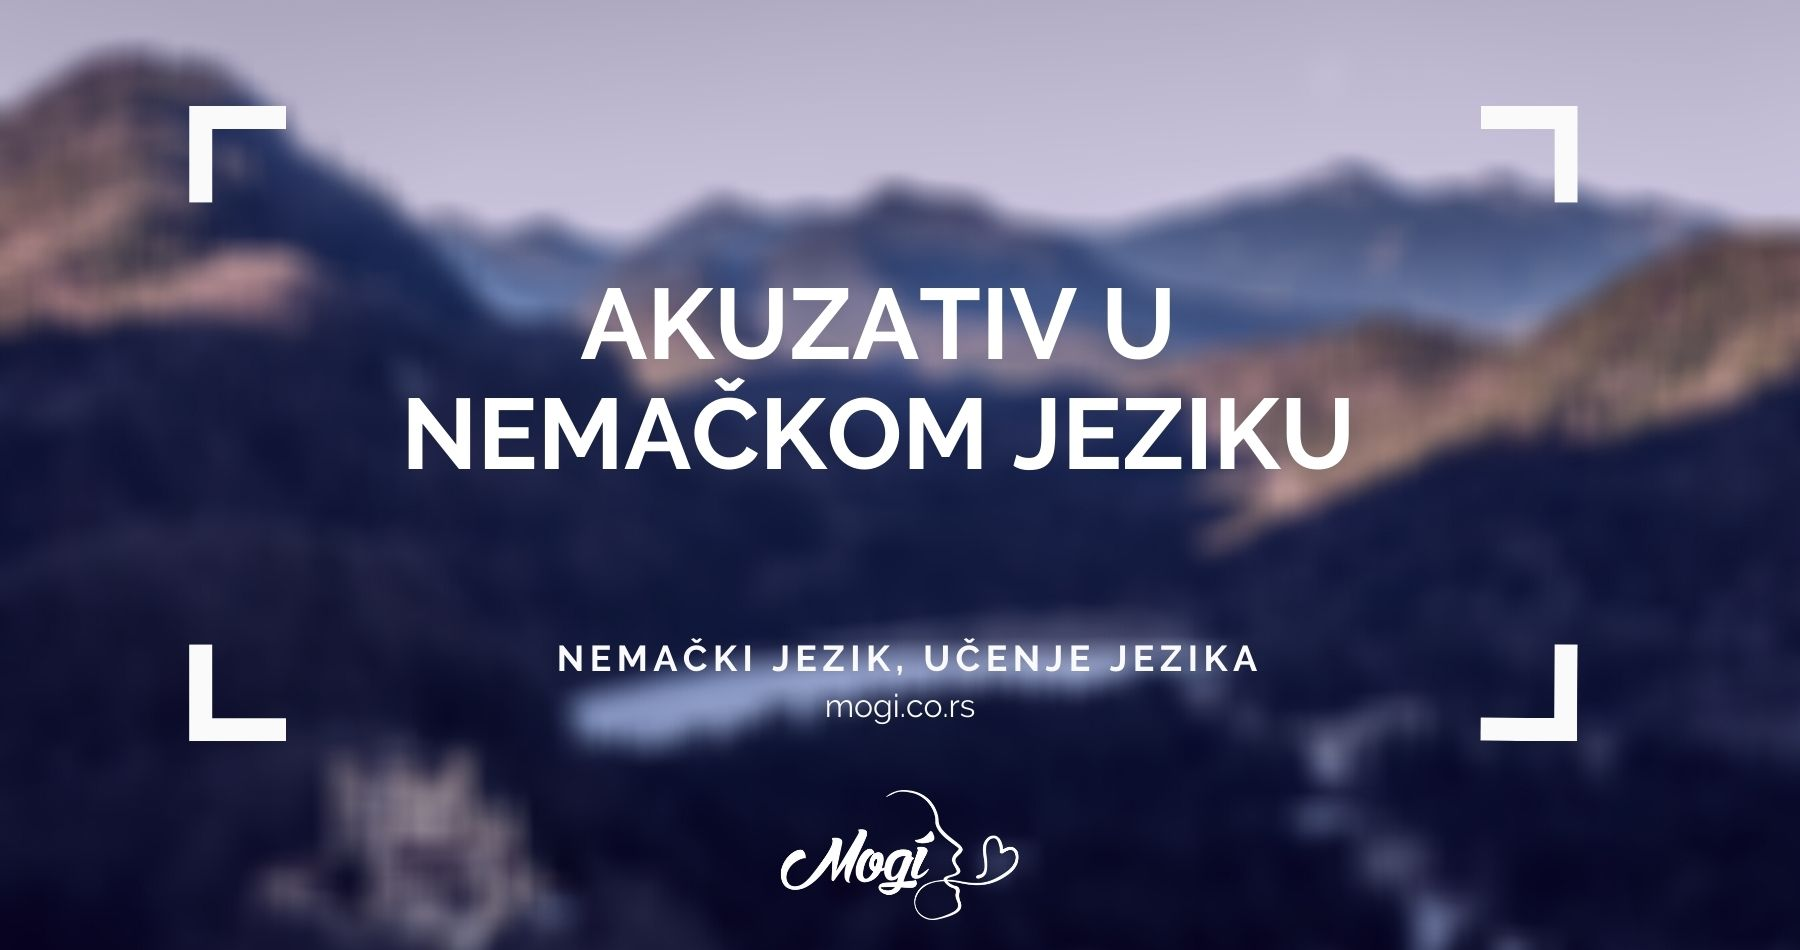 akuzativ